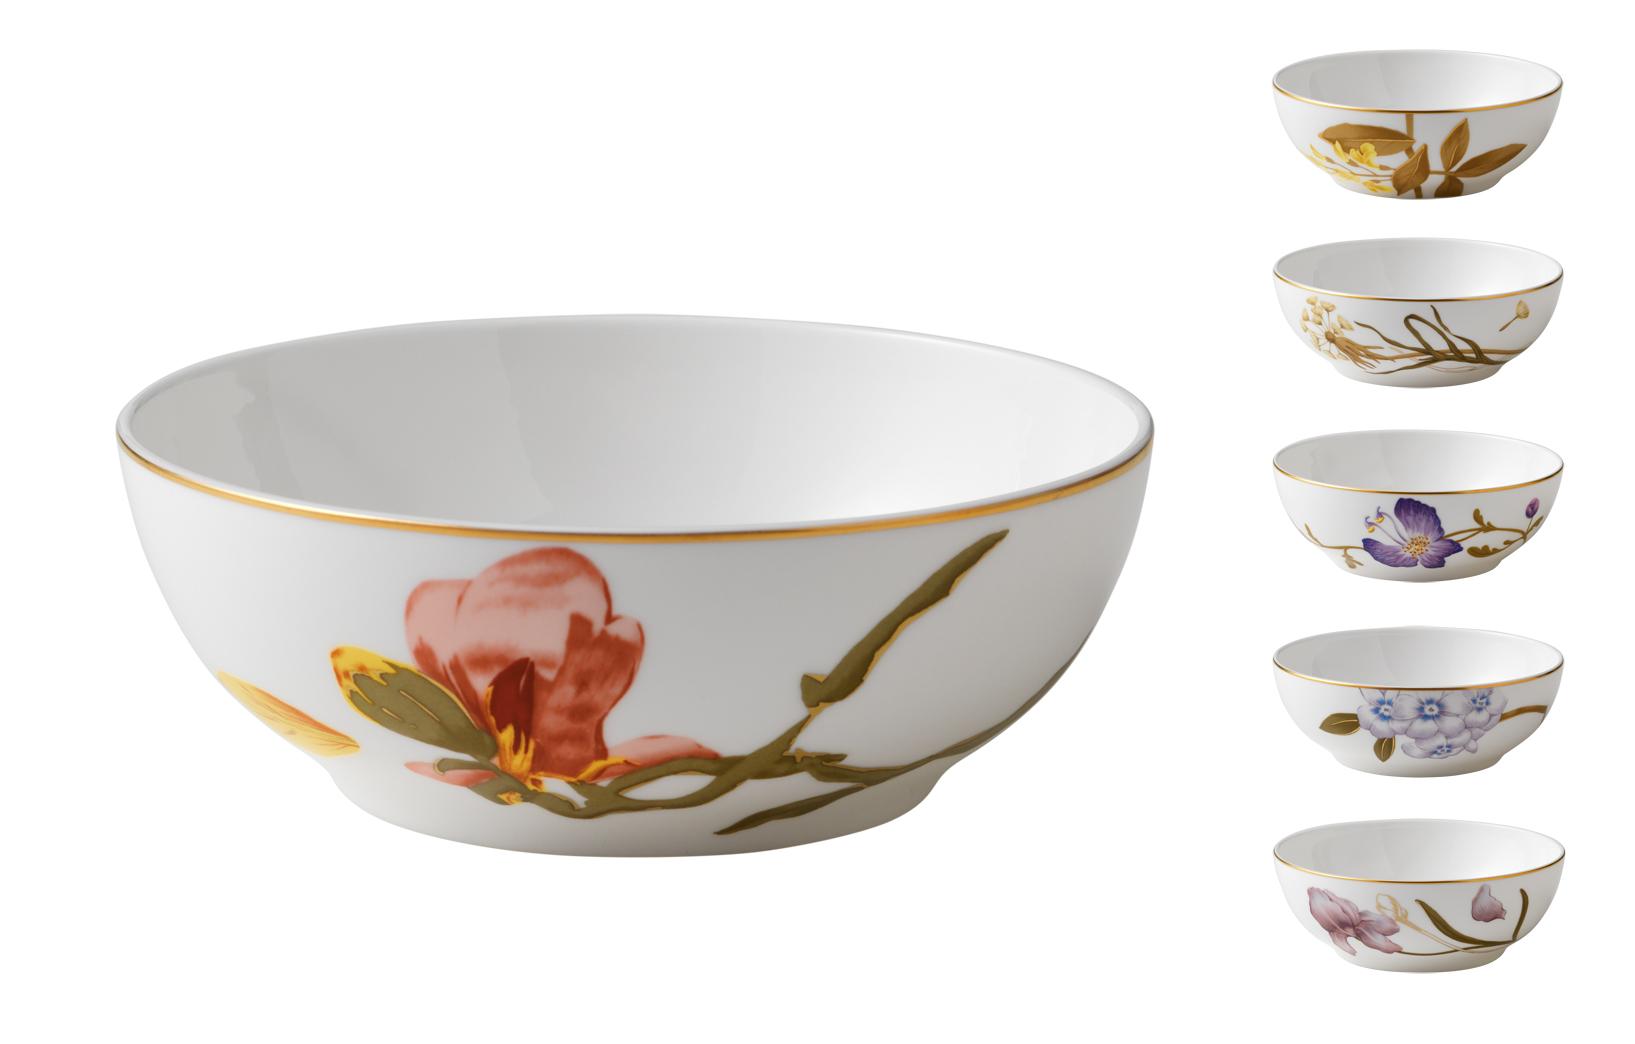 royal copenhagen flora sch ssel 14 cm scandinavian lifestyle. Black Bedroom Furniture Sets. Home Design Ideas